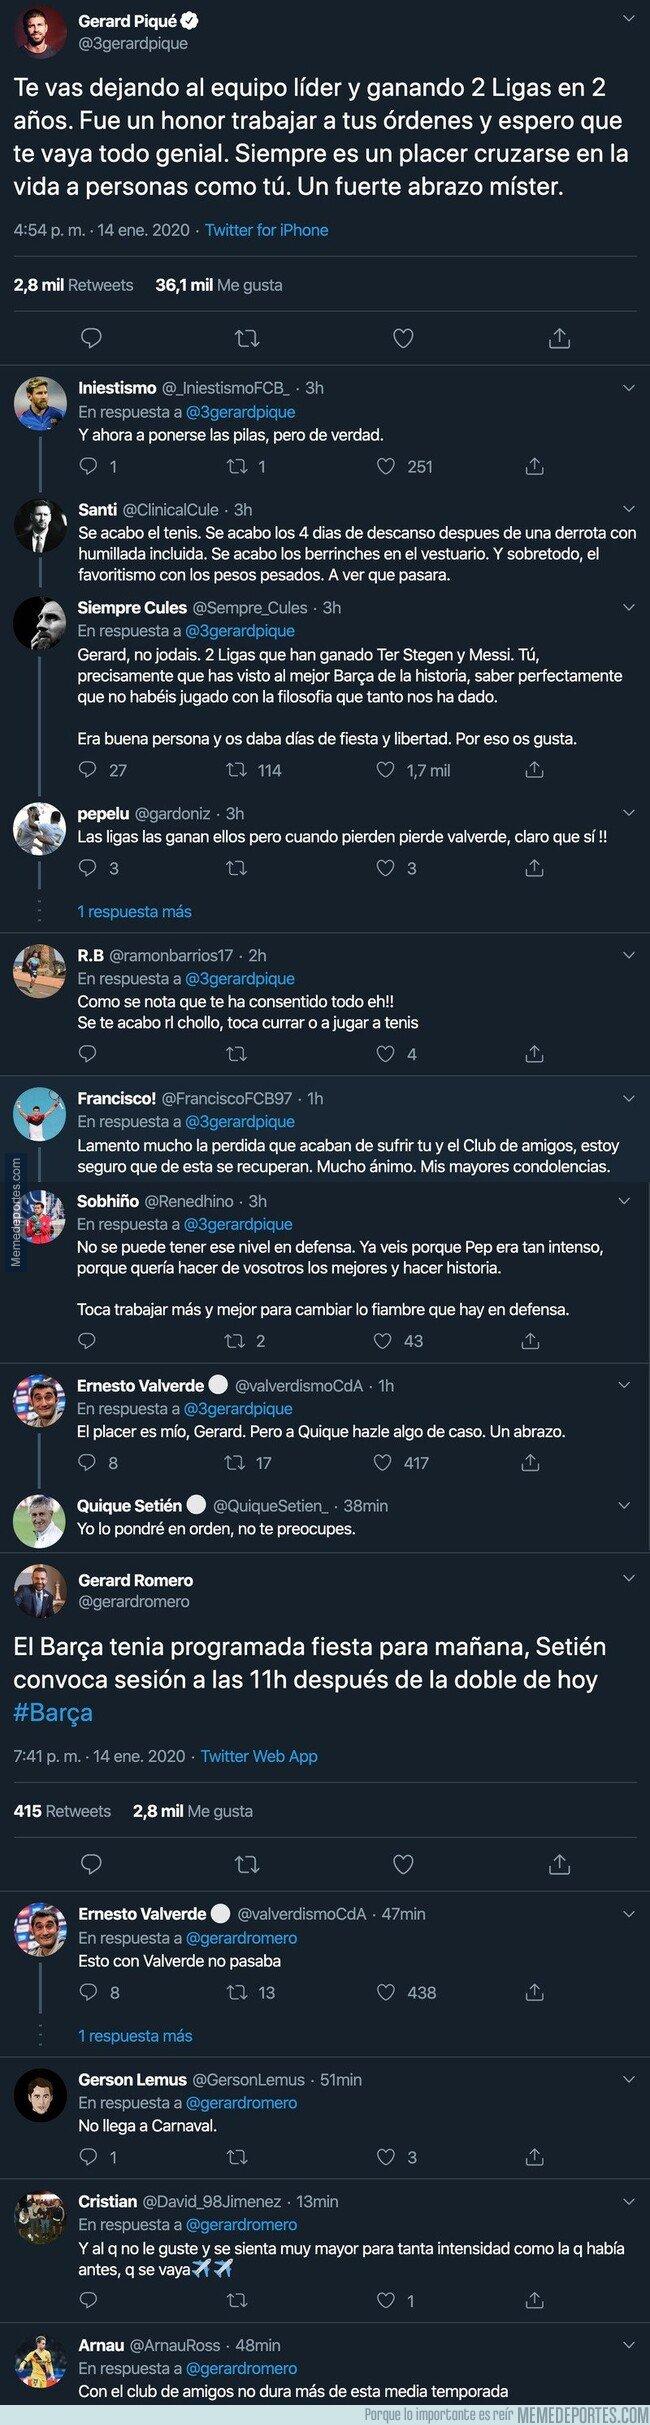 1095845 - El 'dardo' de Piqué a Bartomeu con este mensaje tras despedir a Valverde